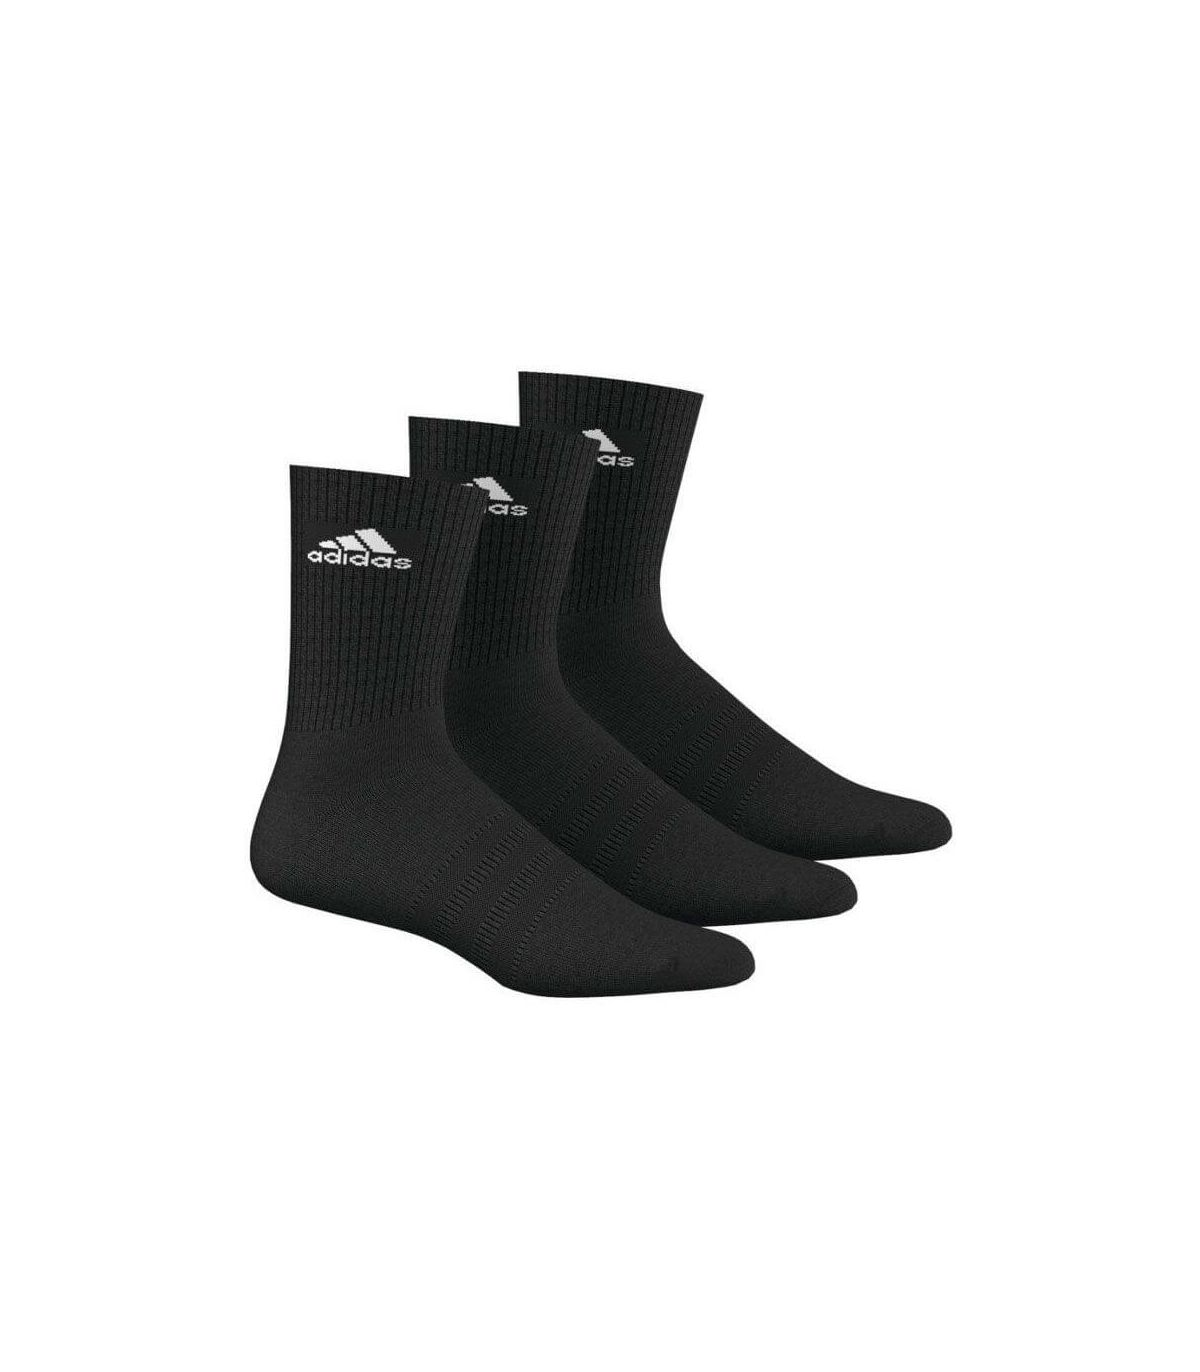 Adidas 3S Performance Ankle Half Negro Adidas Calcetines Running Zapatillas Running Tallas: 35 / 38; Color: negro